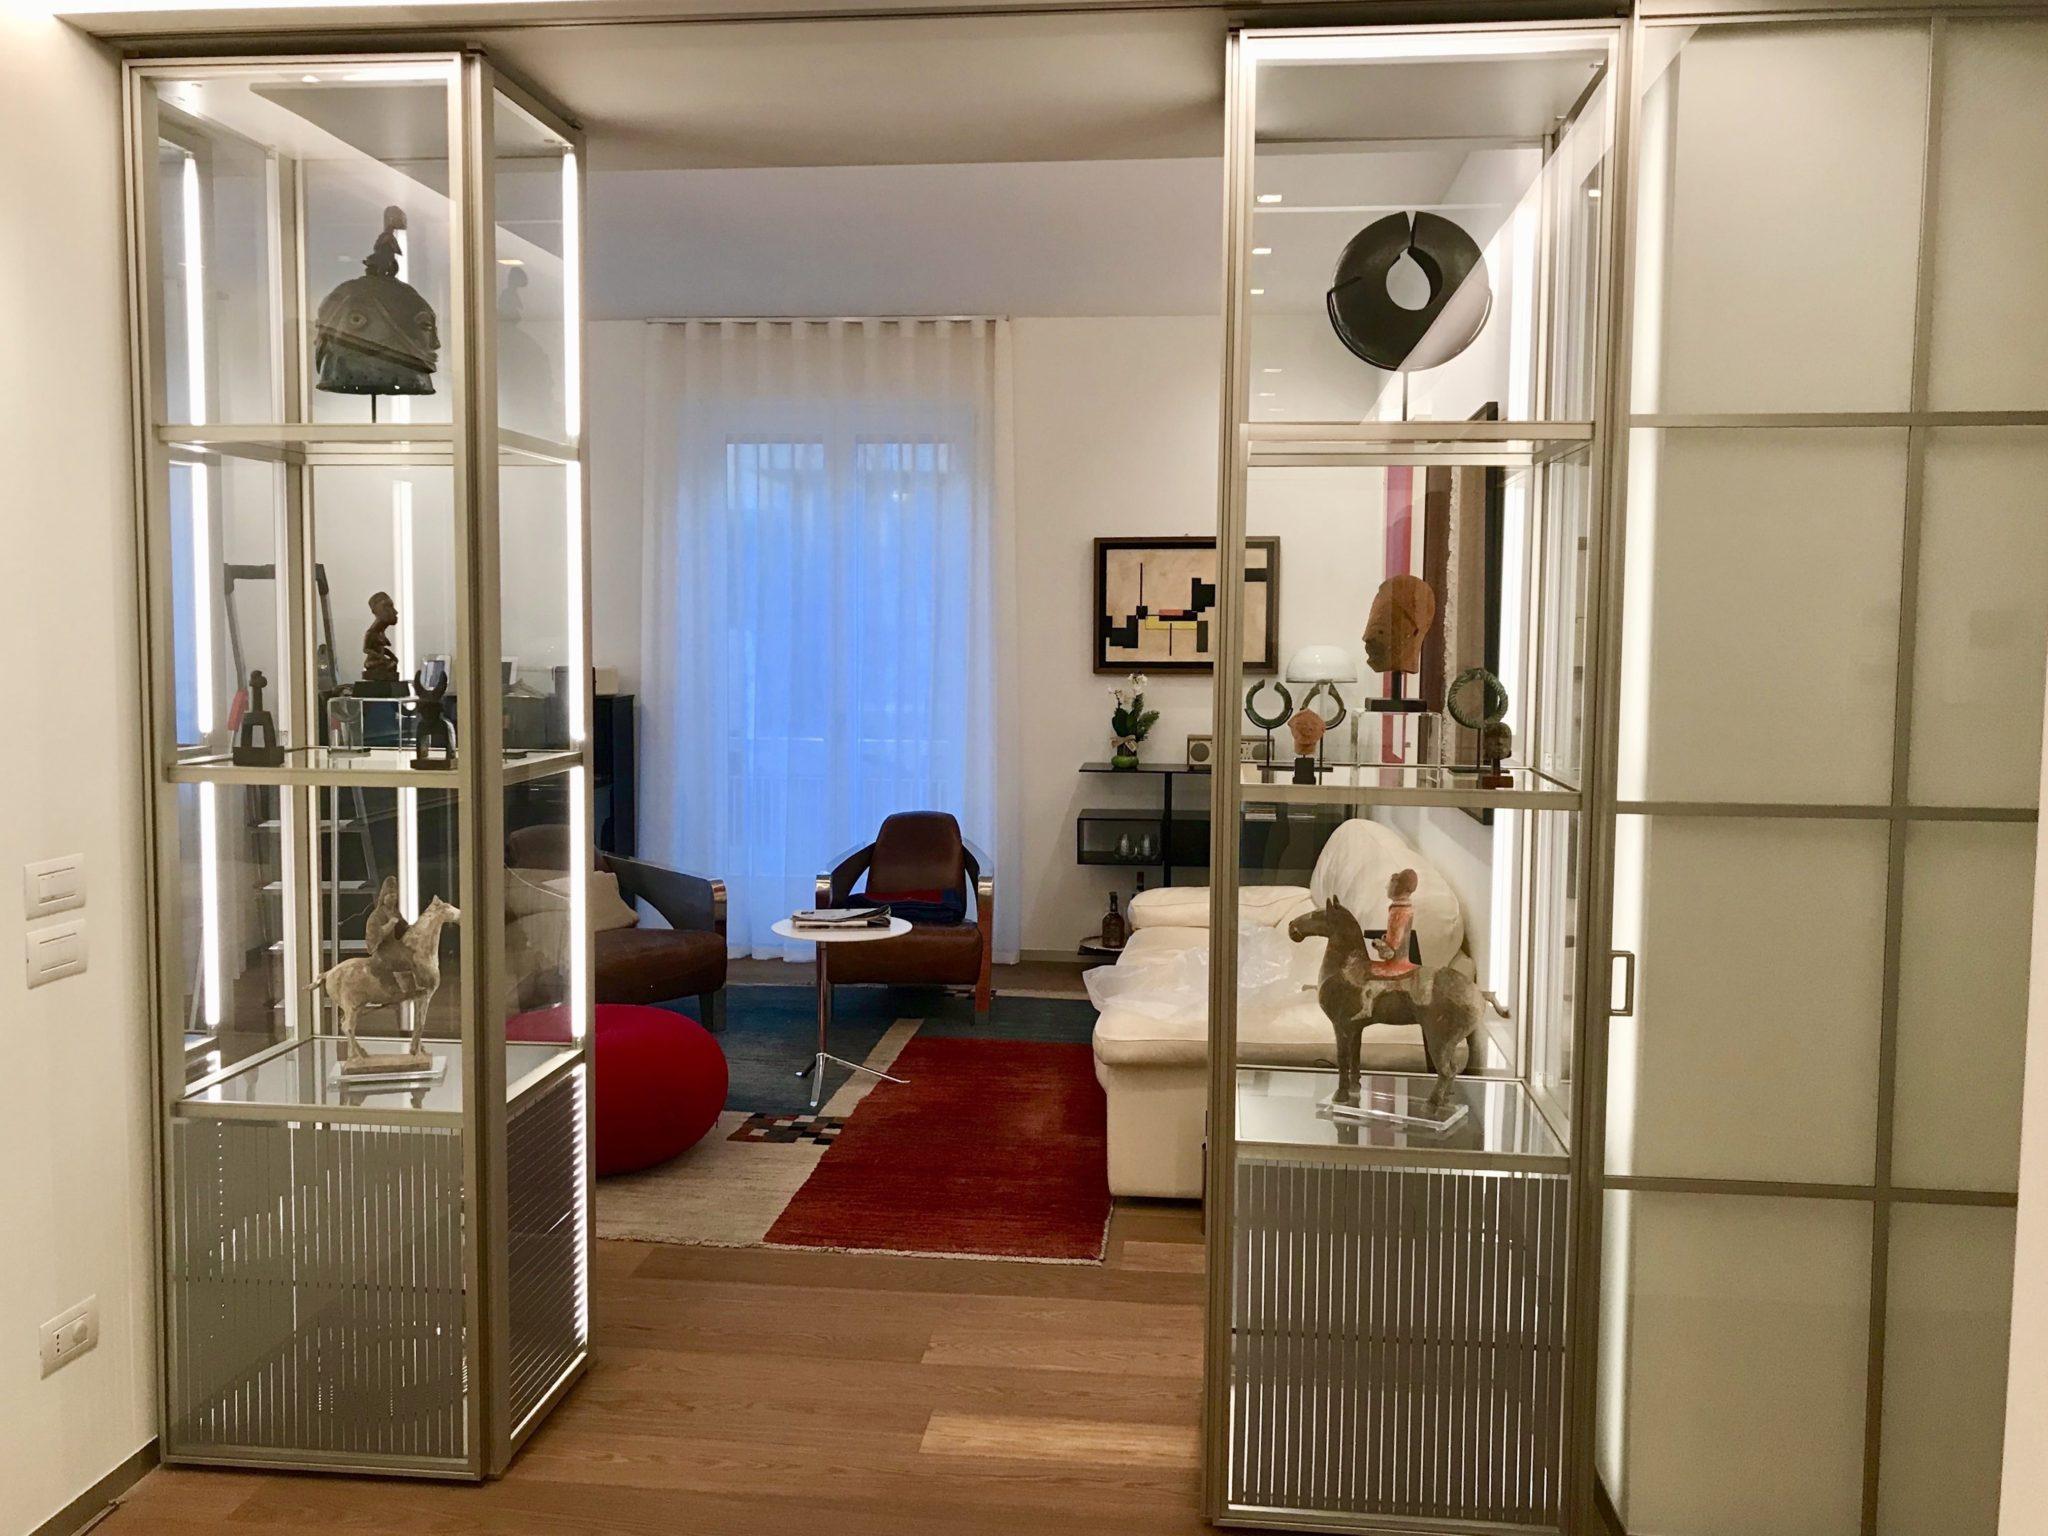 Scorritenda Hesse, confezione Onda - Bergamo